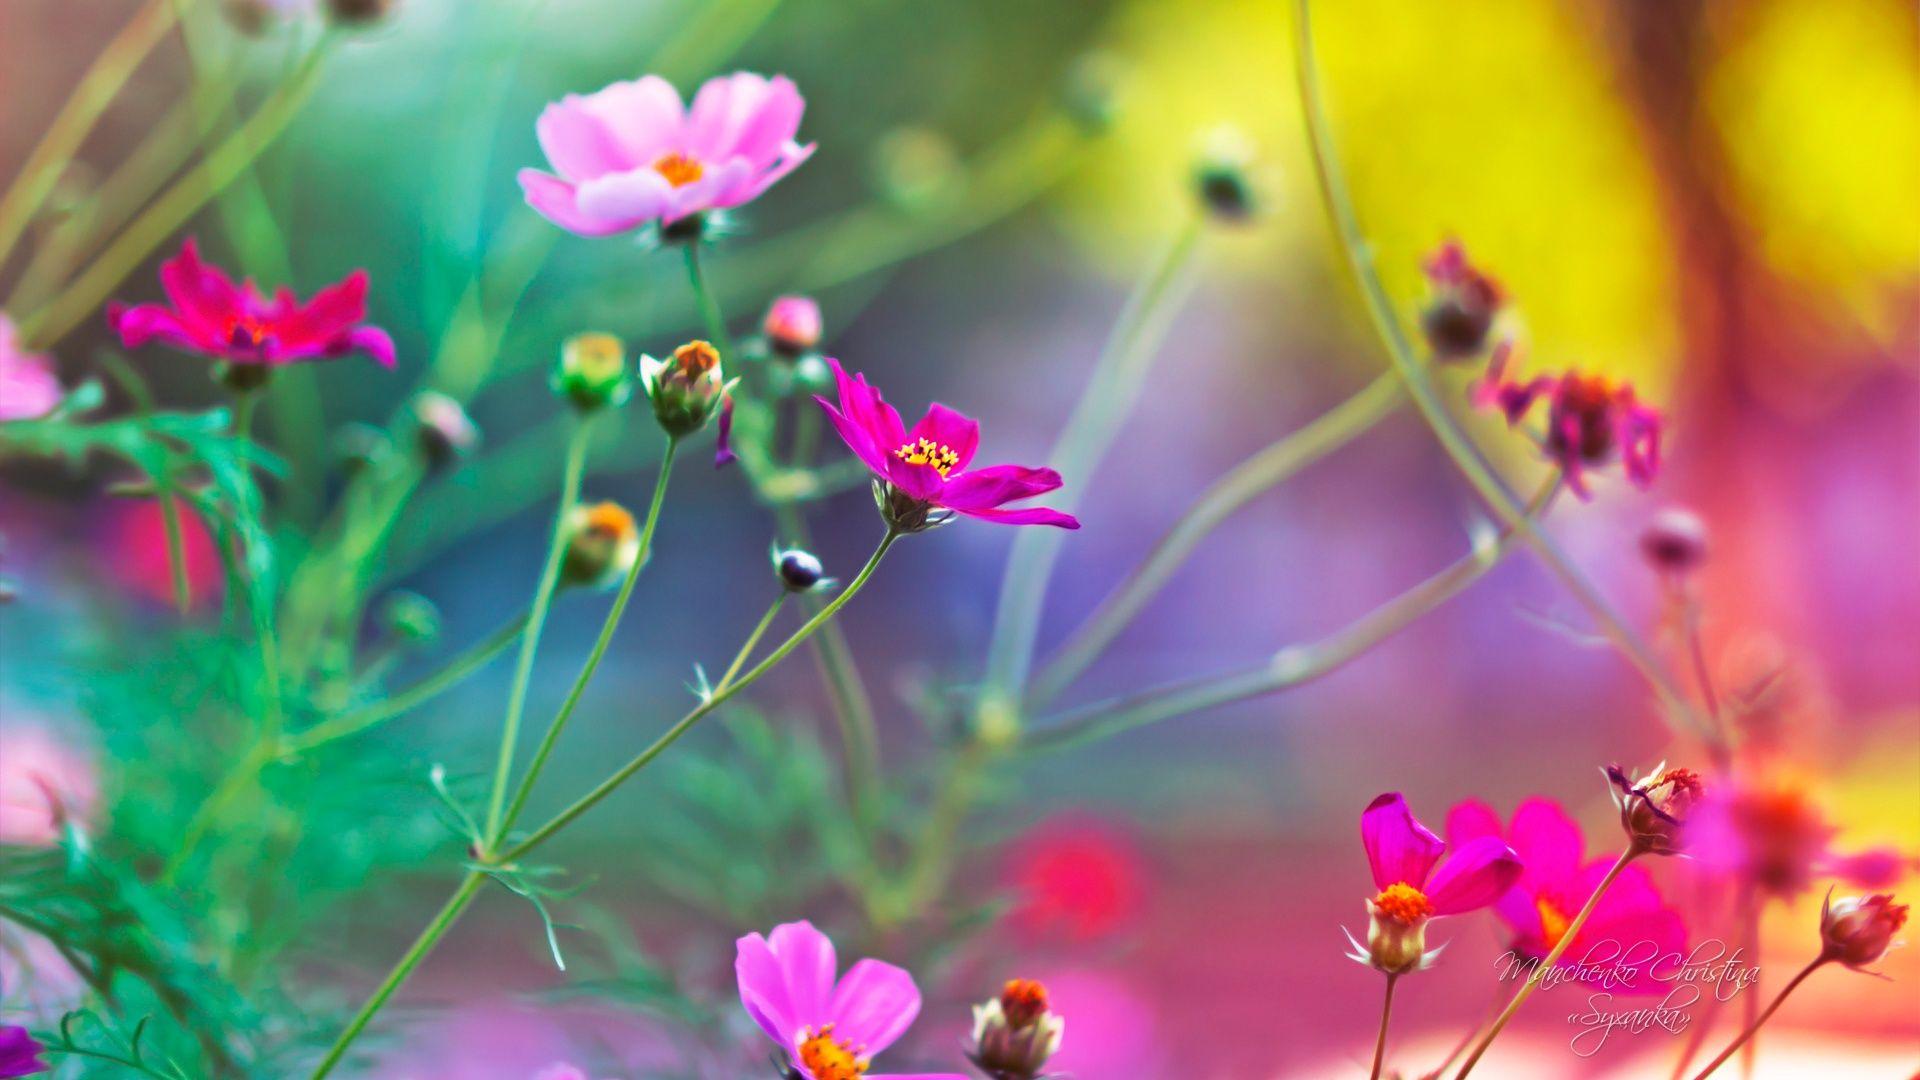 Hd Wallpapers Flowers